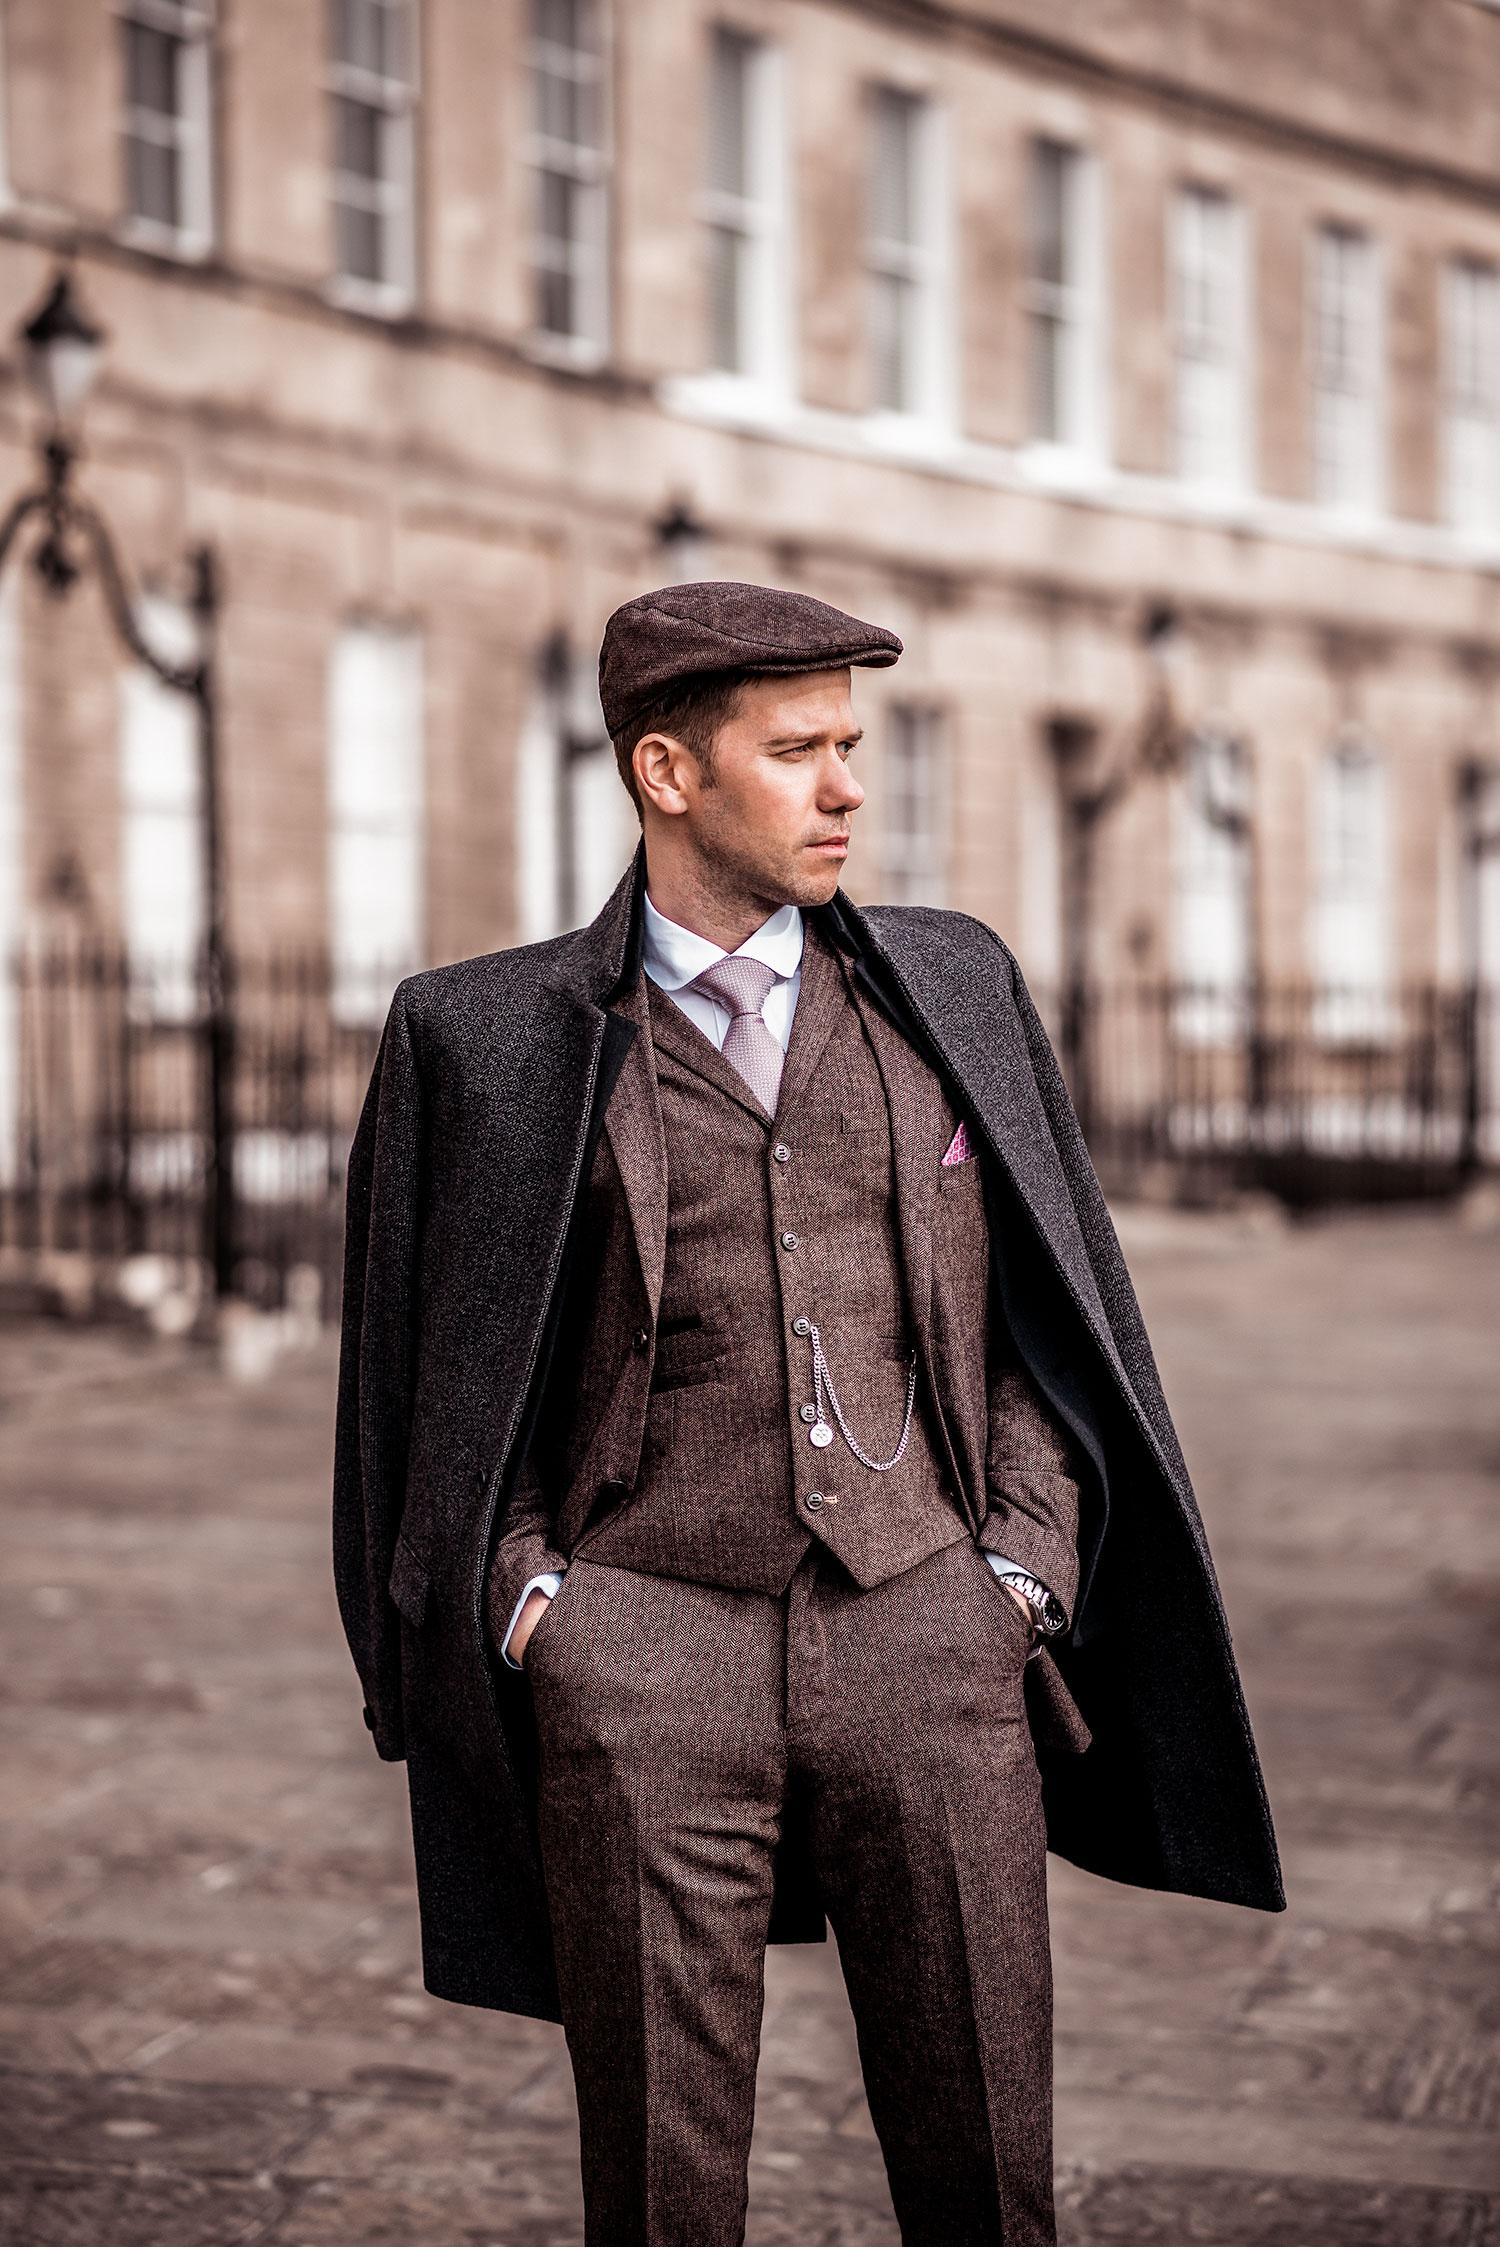 Peaky Blinders Tweed Outfit How To Dress Like Thomas